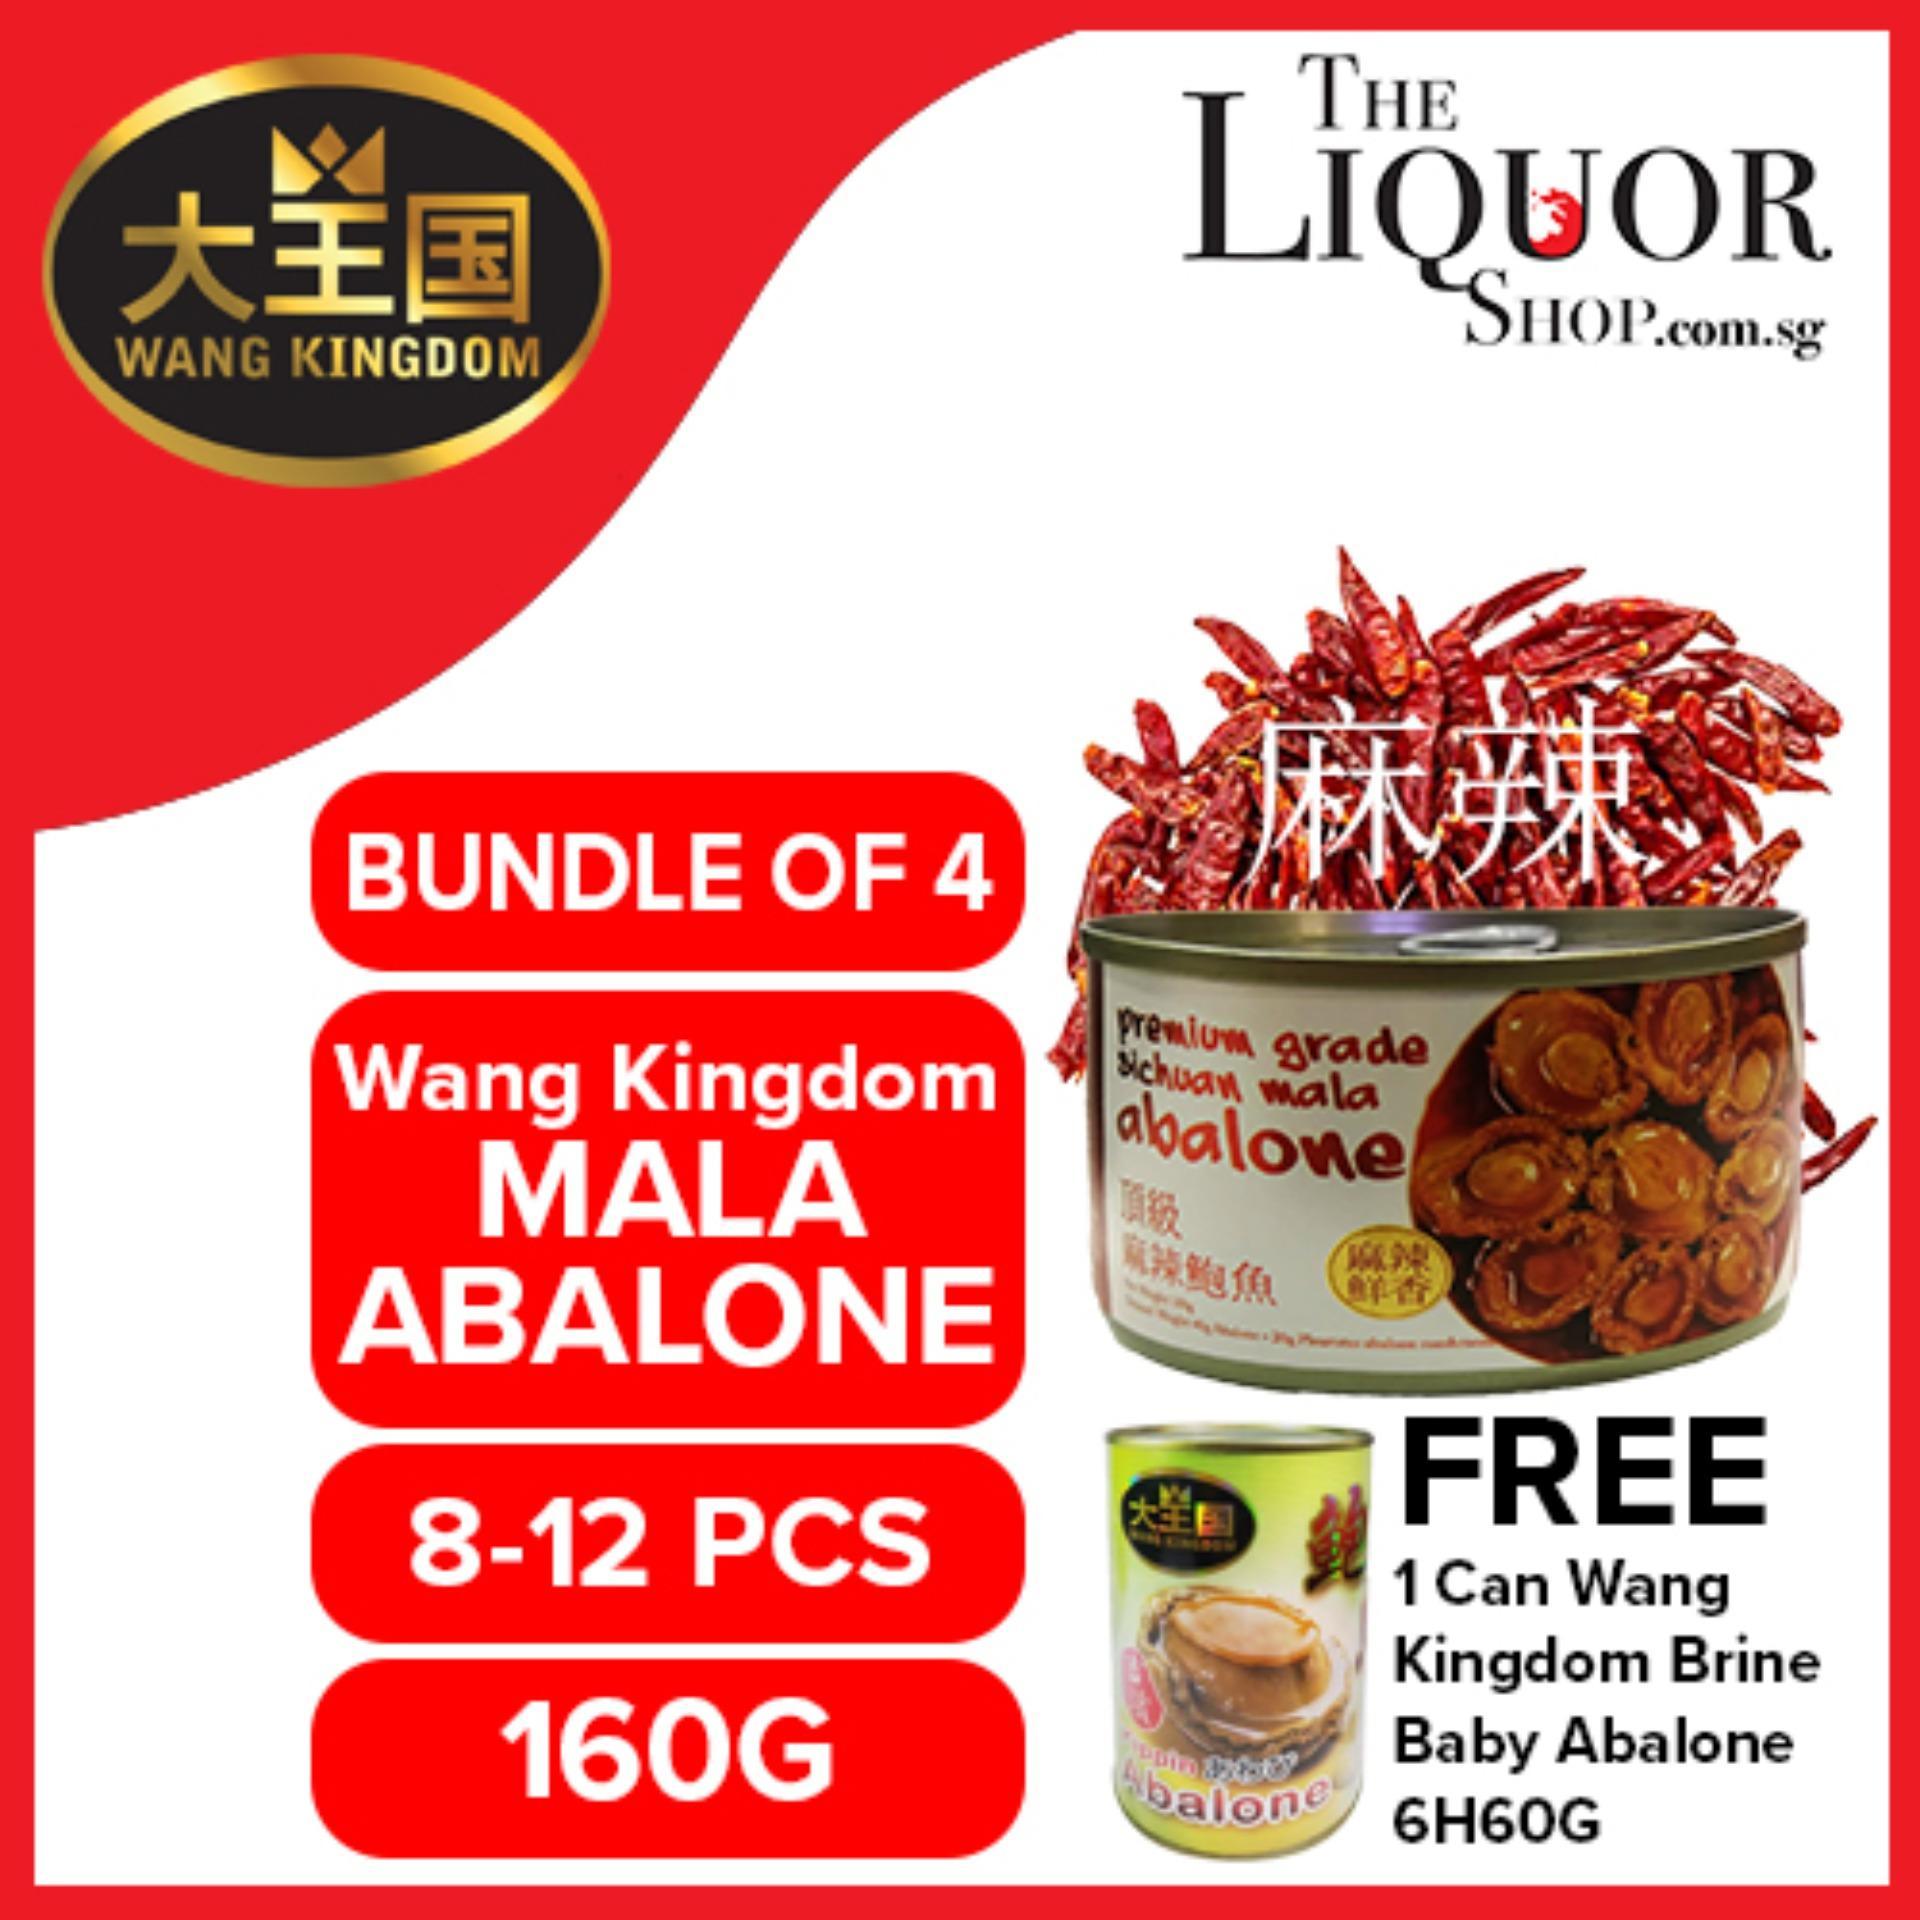 Bundle Of 4 Wang Kingdom Mala Abalone Free 1 Can Wang Kingdom Brine Baby Abalone 6h60g By The Liquor Shop.